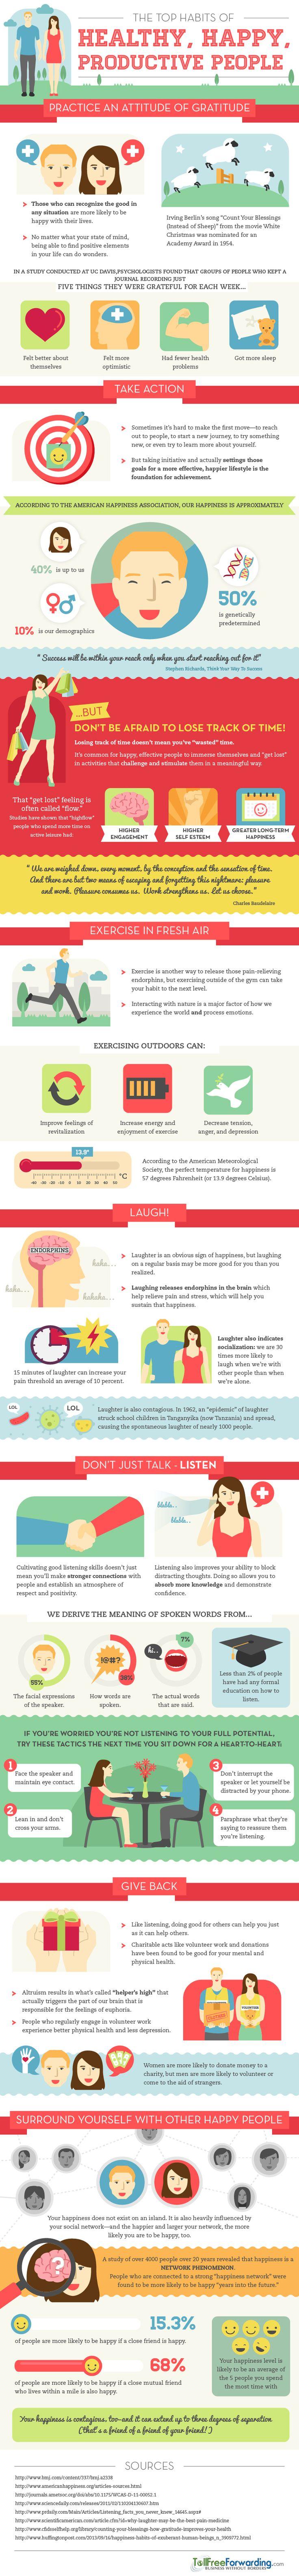 The 7 Habits of Happy People